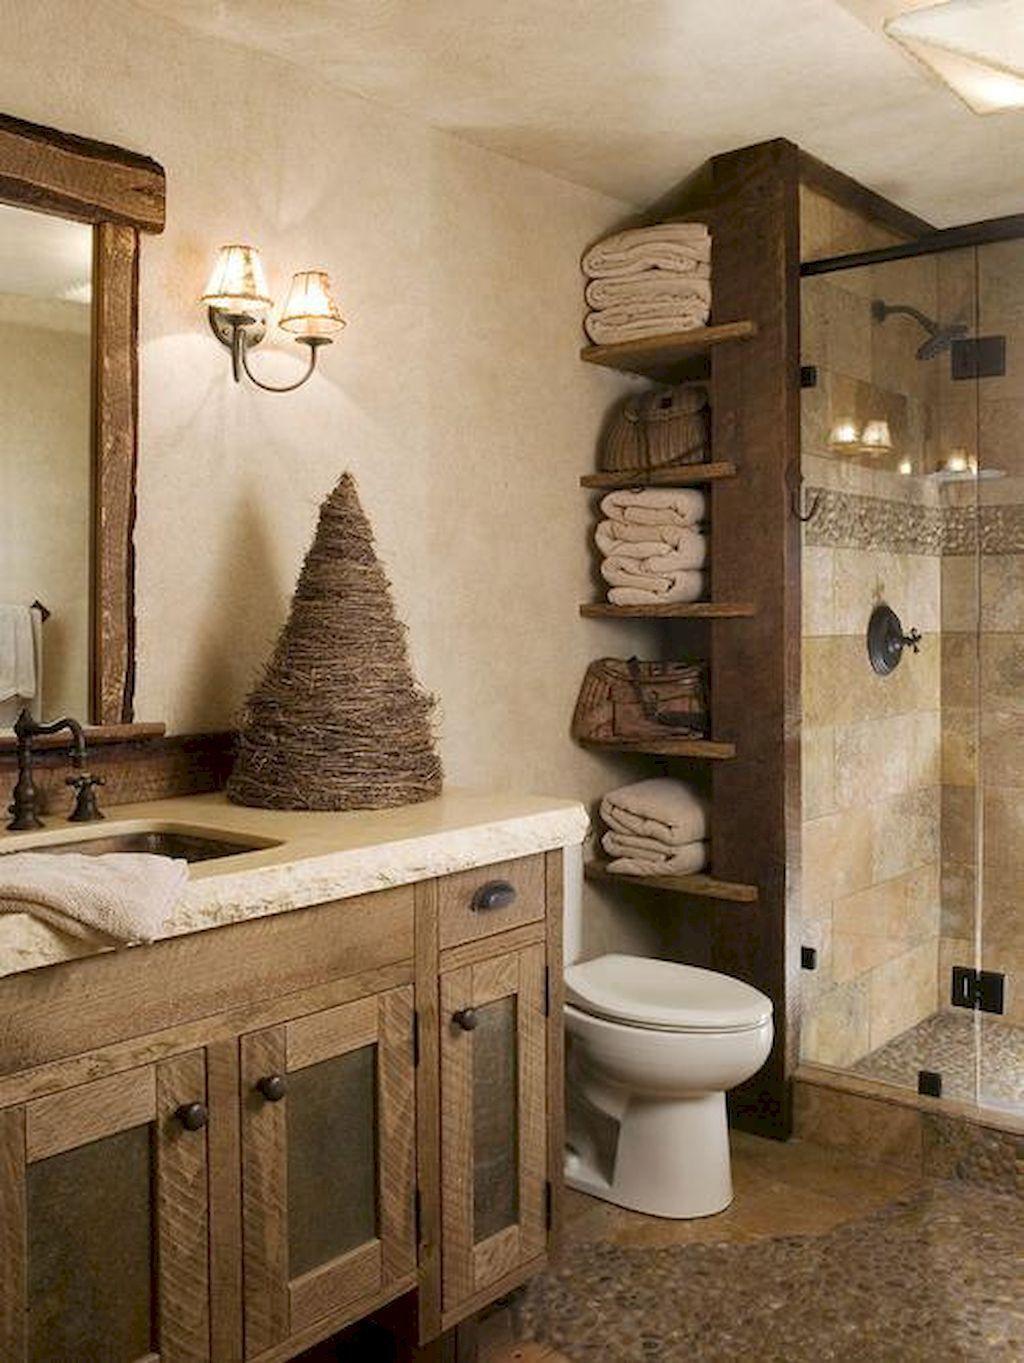 Gorgeous bathroom vanity mirror design ideas 34 ba o - Banos rusticos modernos ...